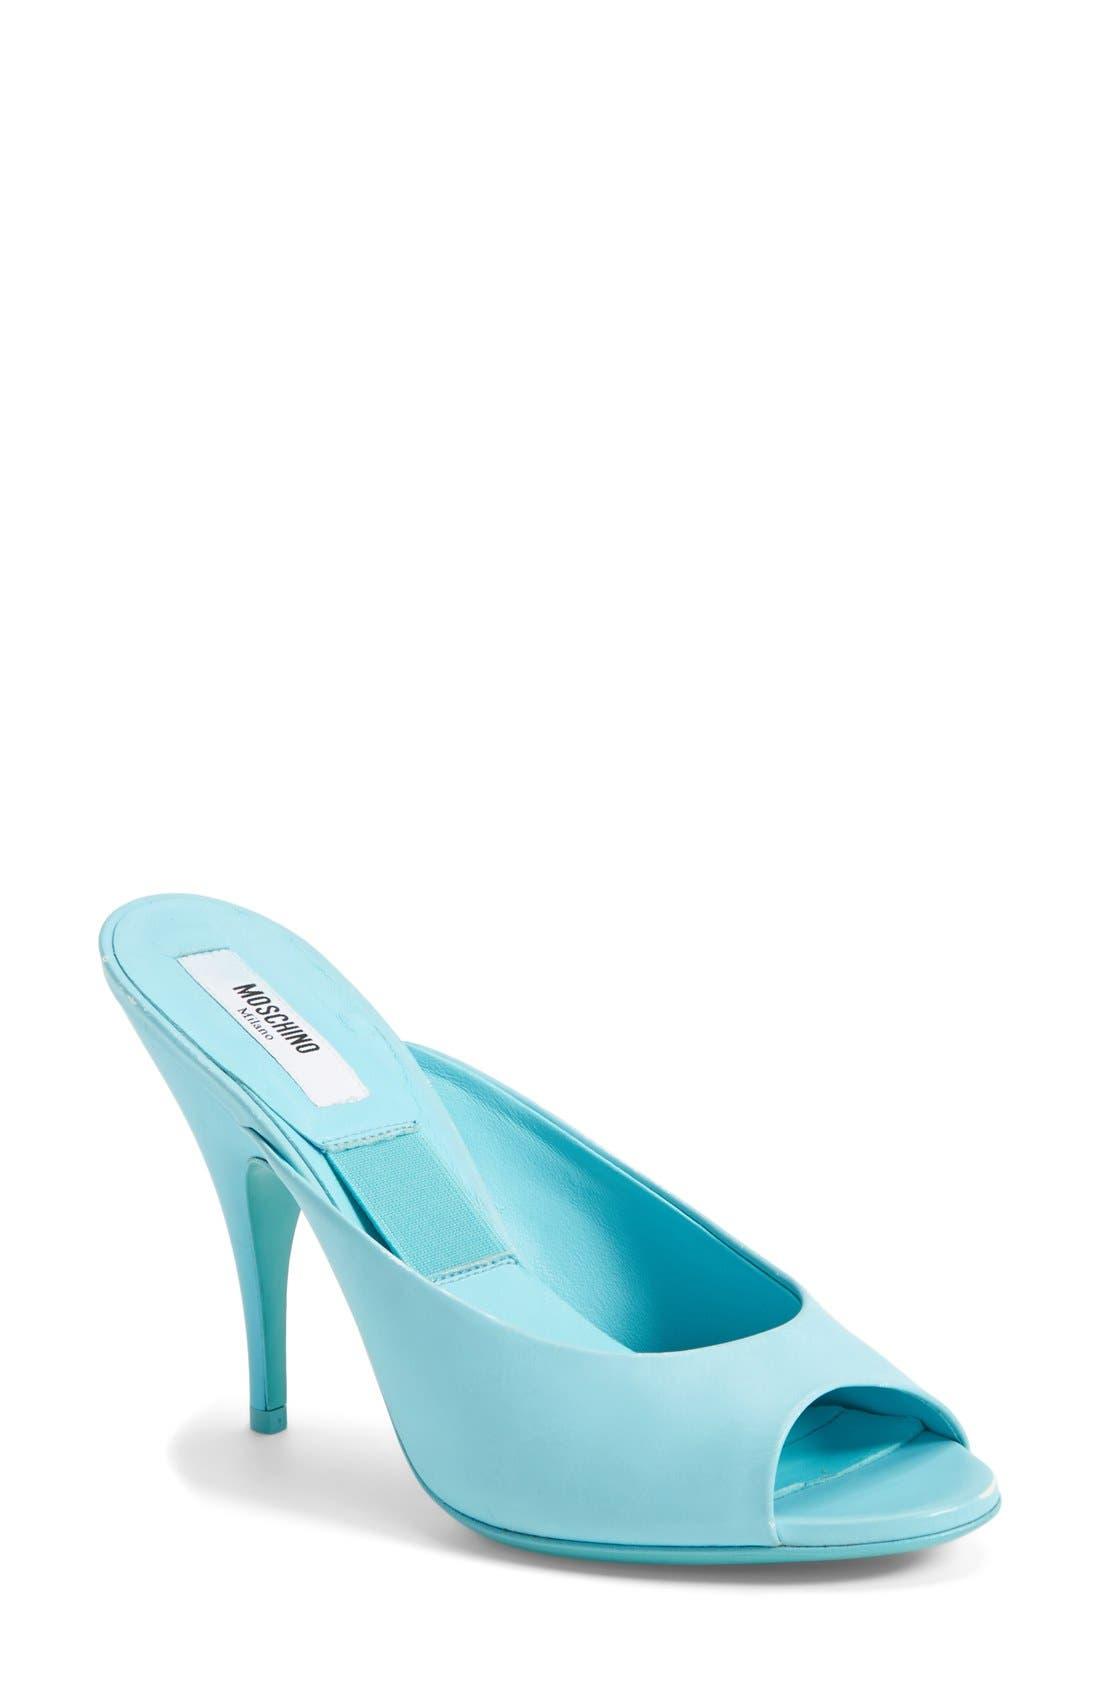 Main Image - Moschino Peep Toe Leather Sandal (Women)